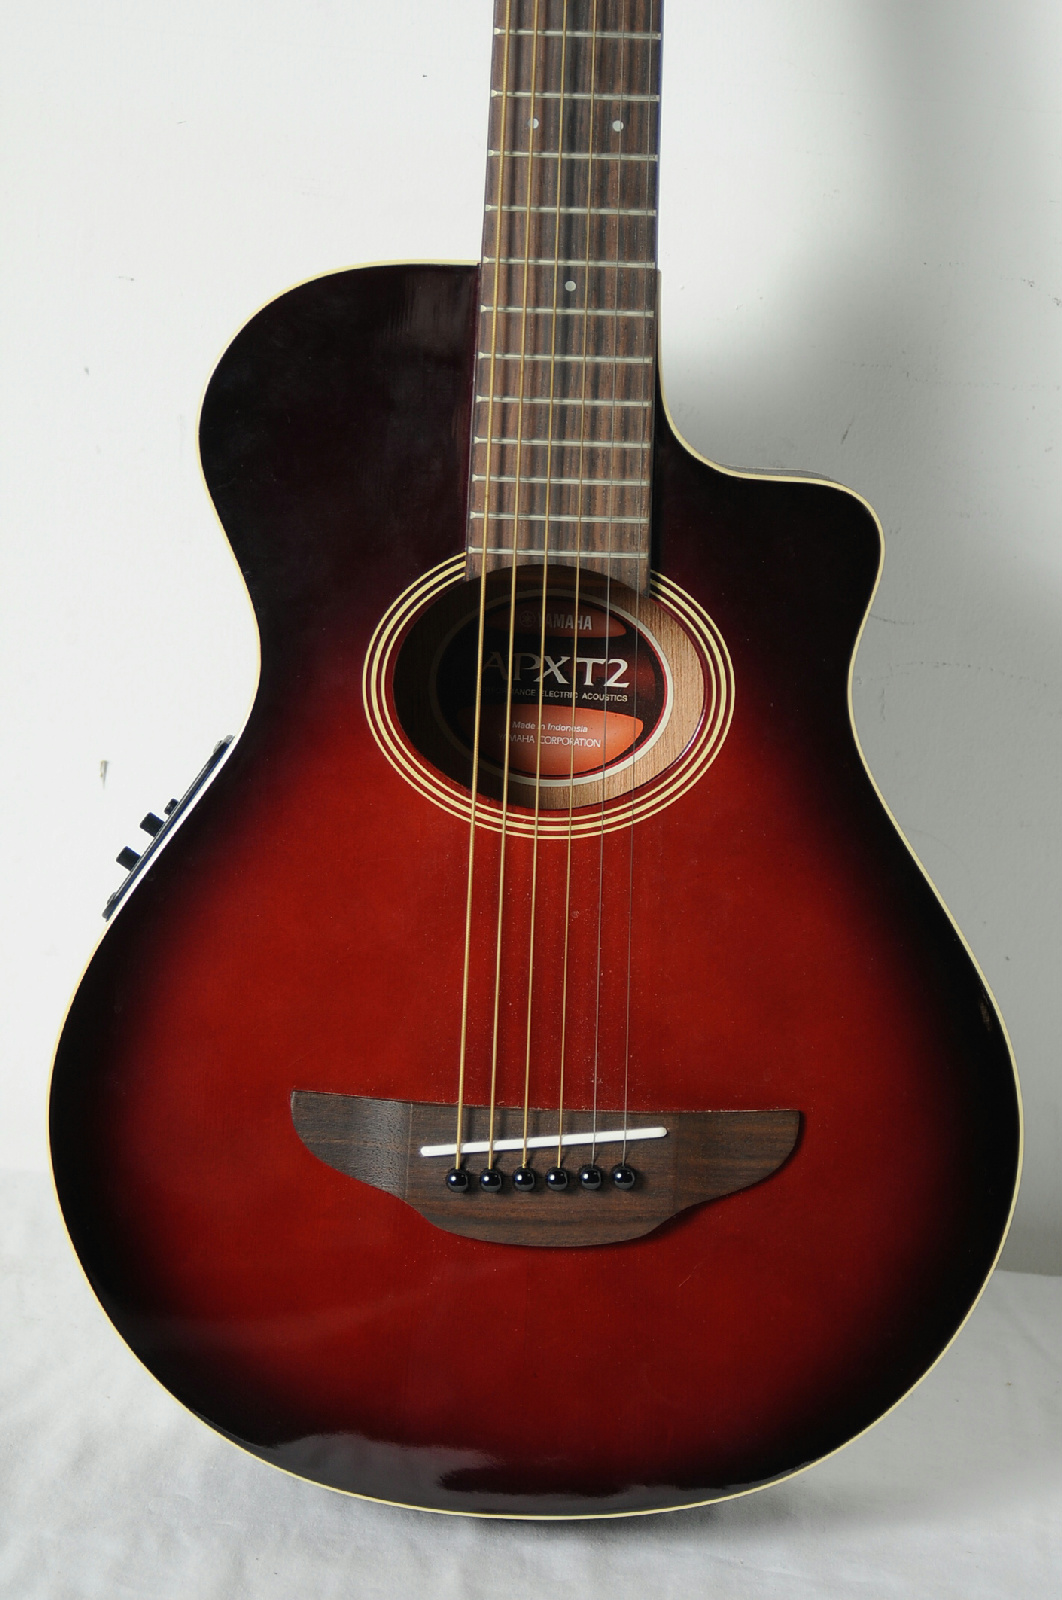 yamaha apxt2 acoustic electric guitar ebay. Black Bedroom Furniture Sets. Home Design Ideas